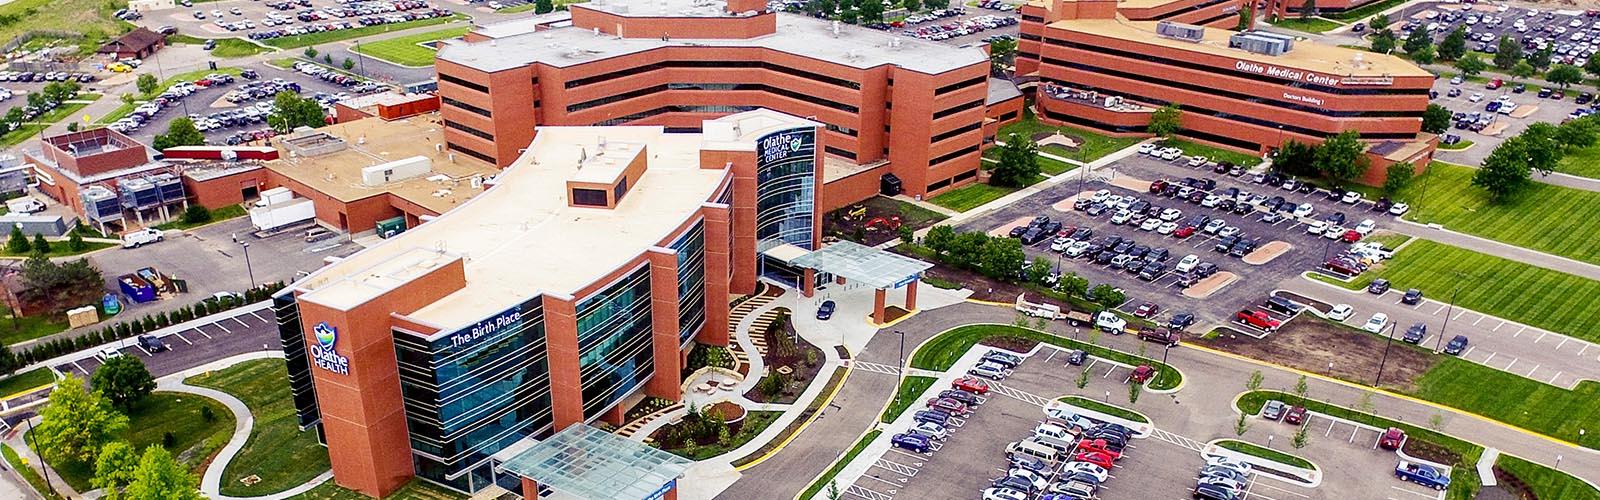 Olathe Health - Birth Place